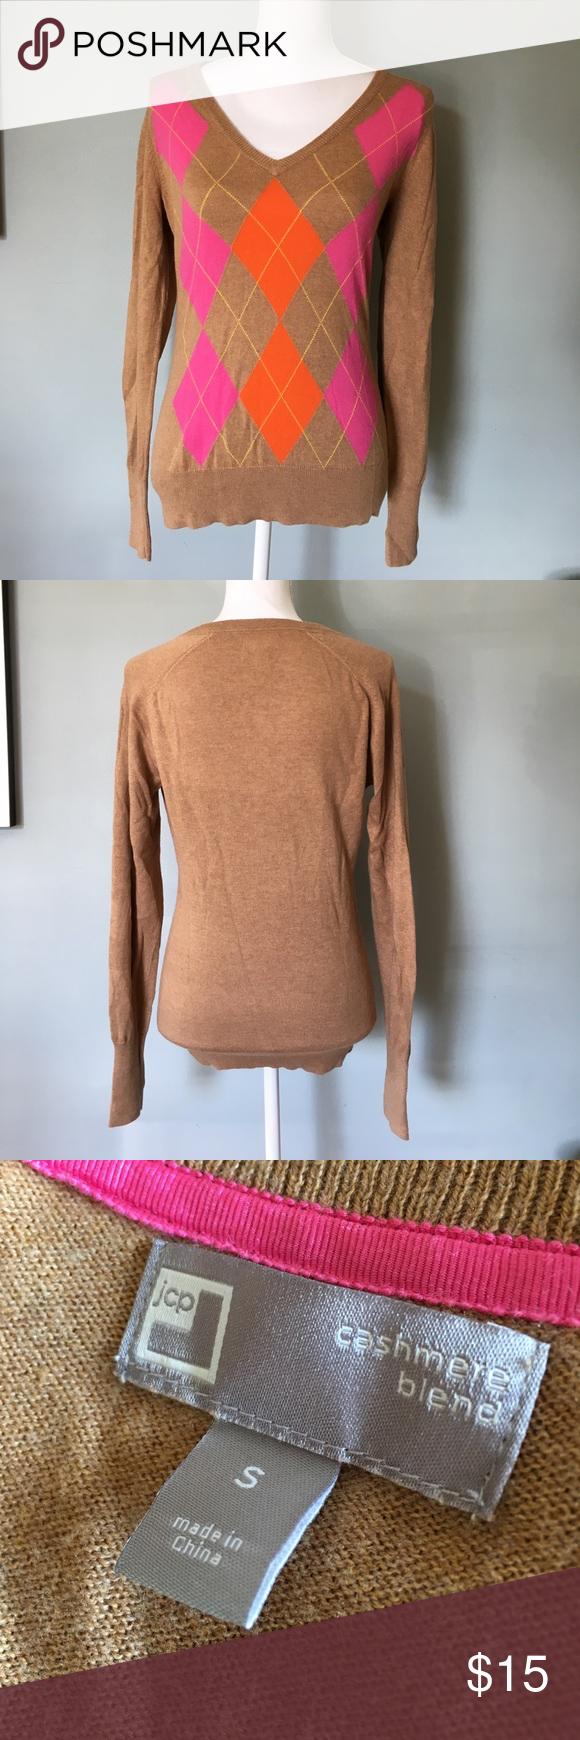 JCP Cashmere Blend Argyle Sweater NWOT JCP cashmere blend argyle v ...